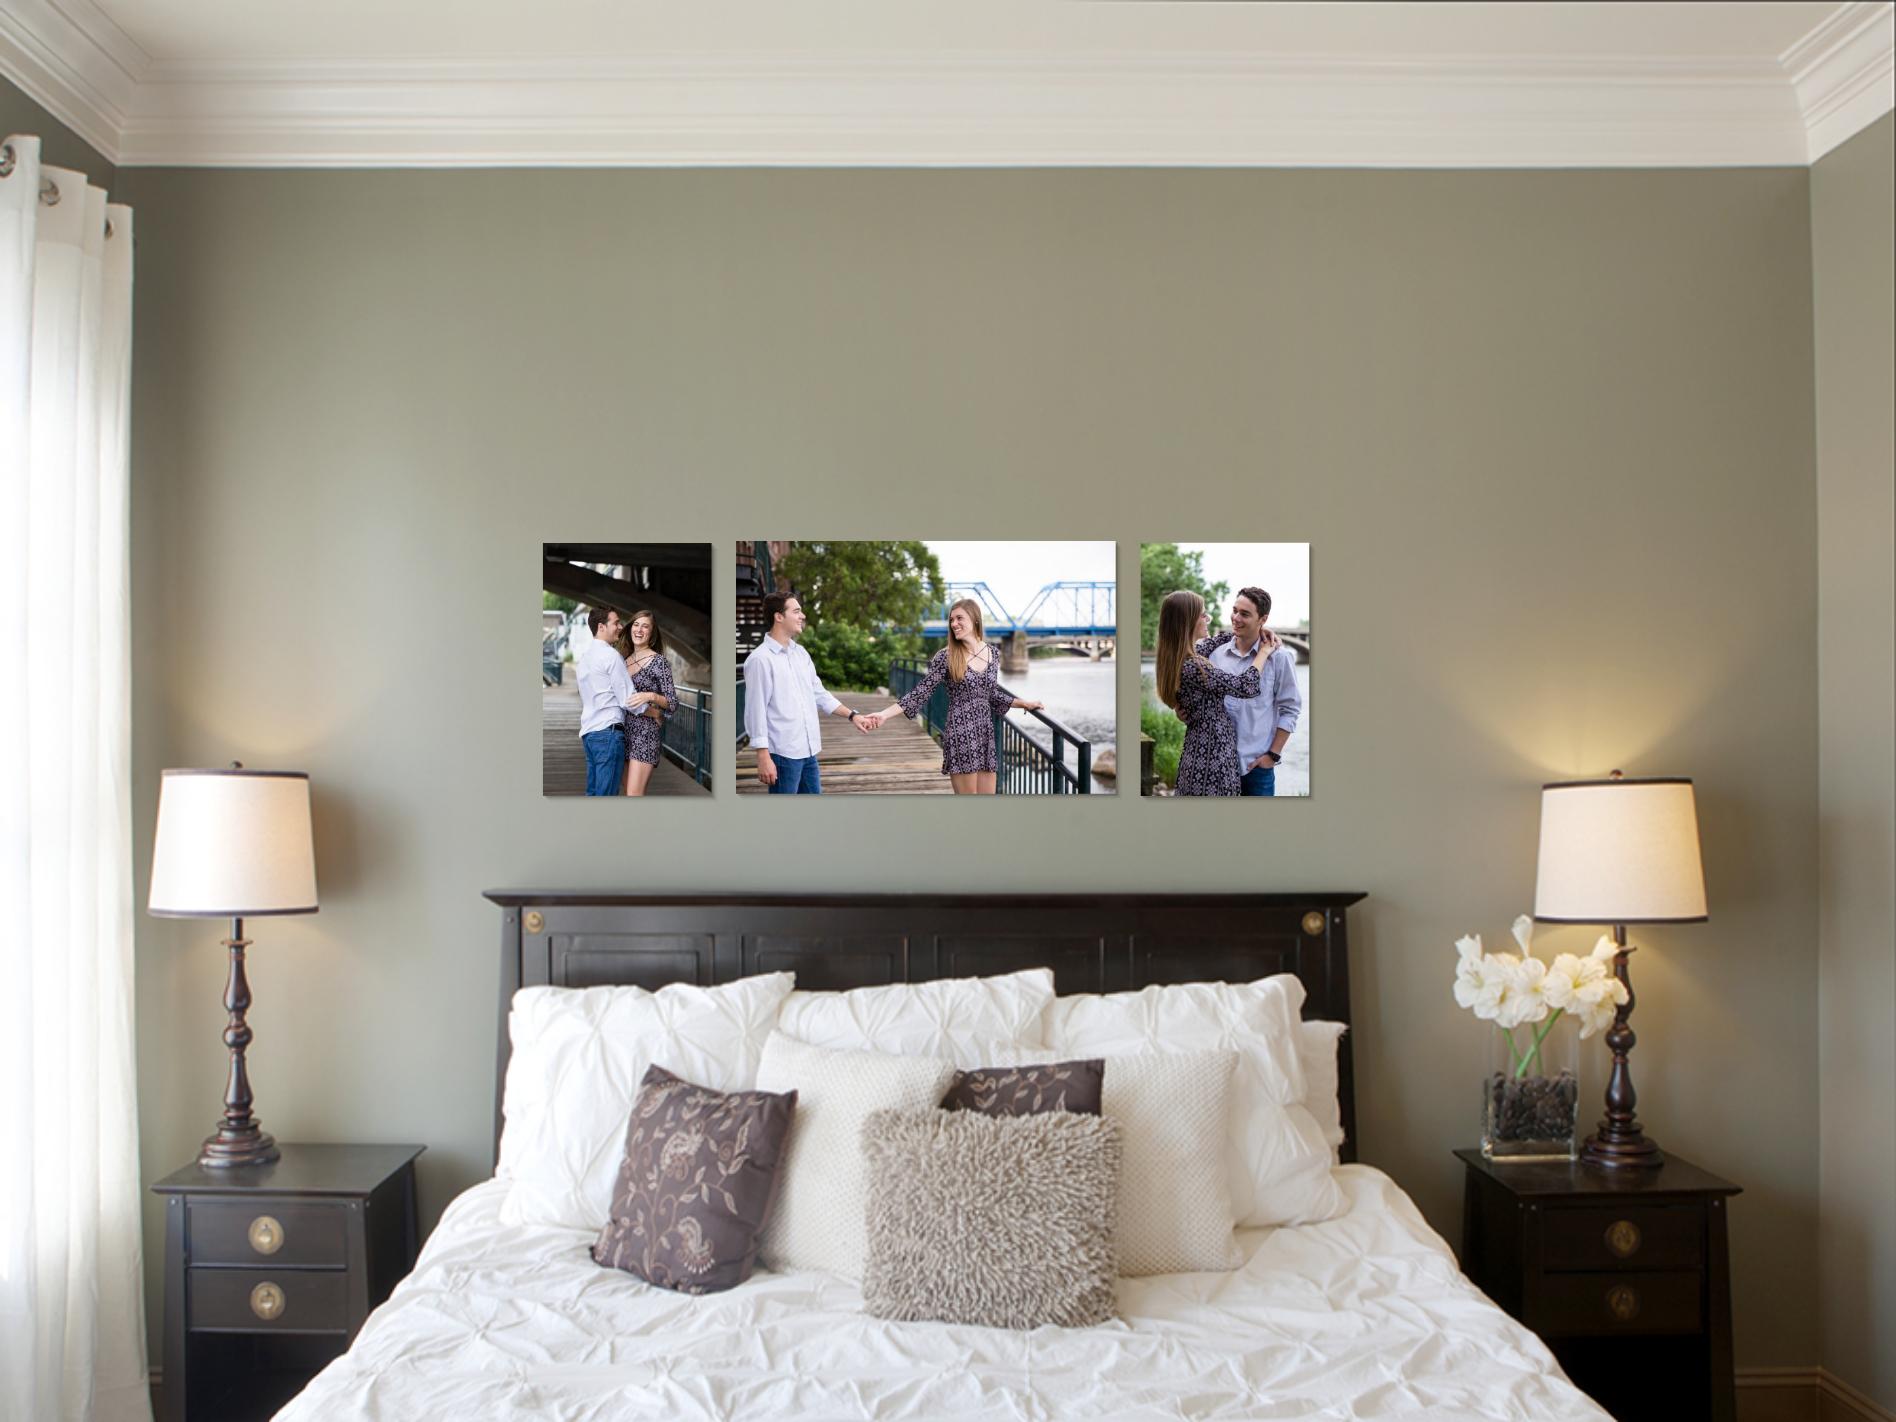 Luxury Wedding and Couples Photographer_Lansing MI_Wall Art Gallery Design_Tania Watt Photography.jpg